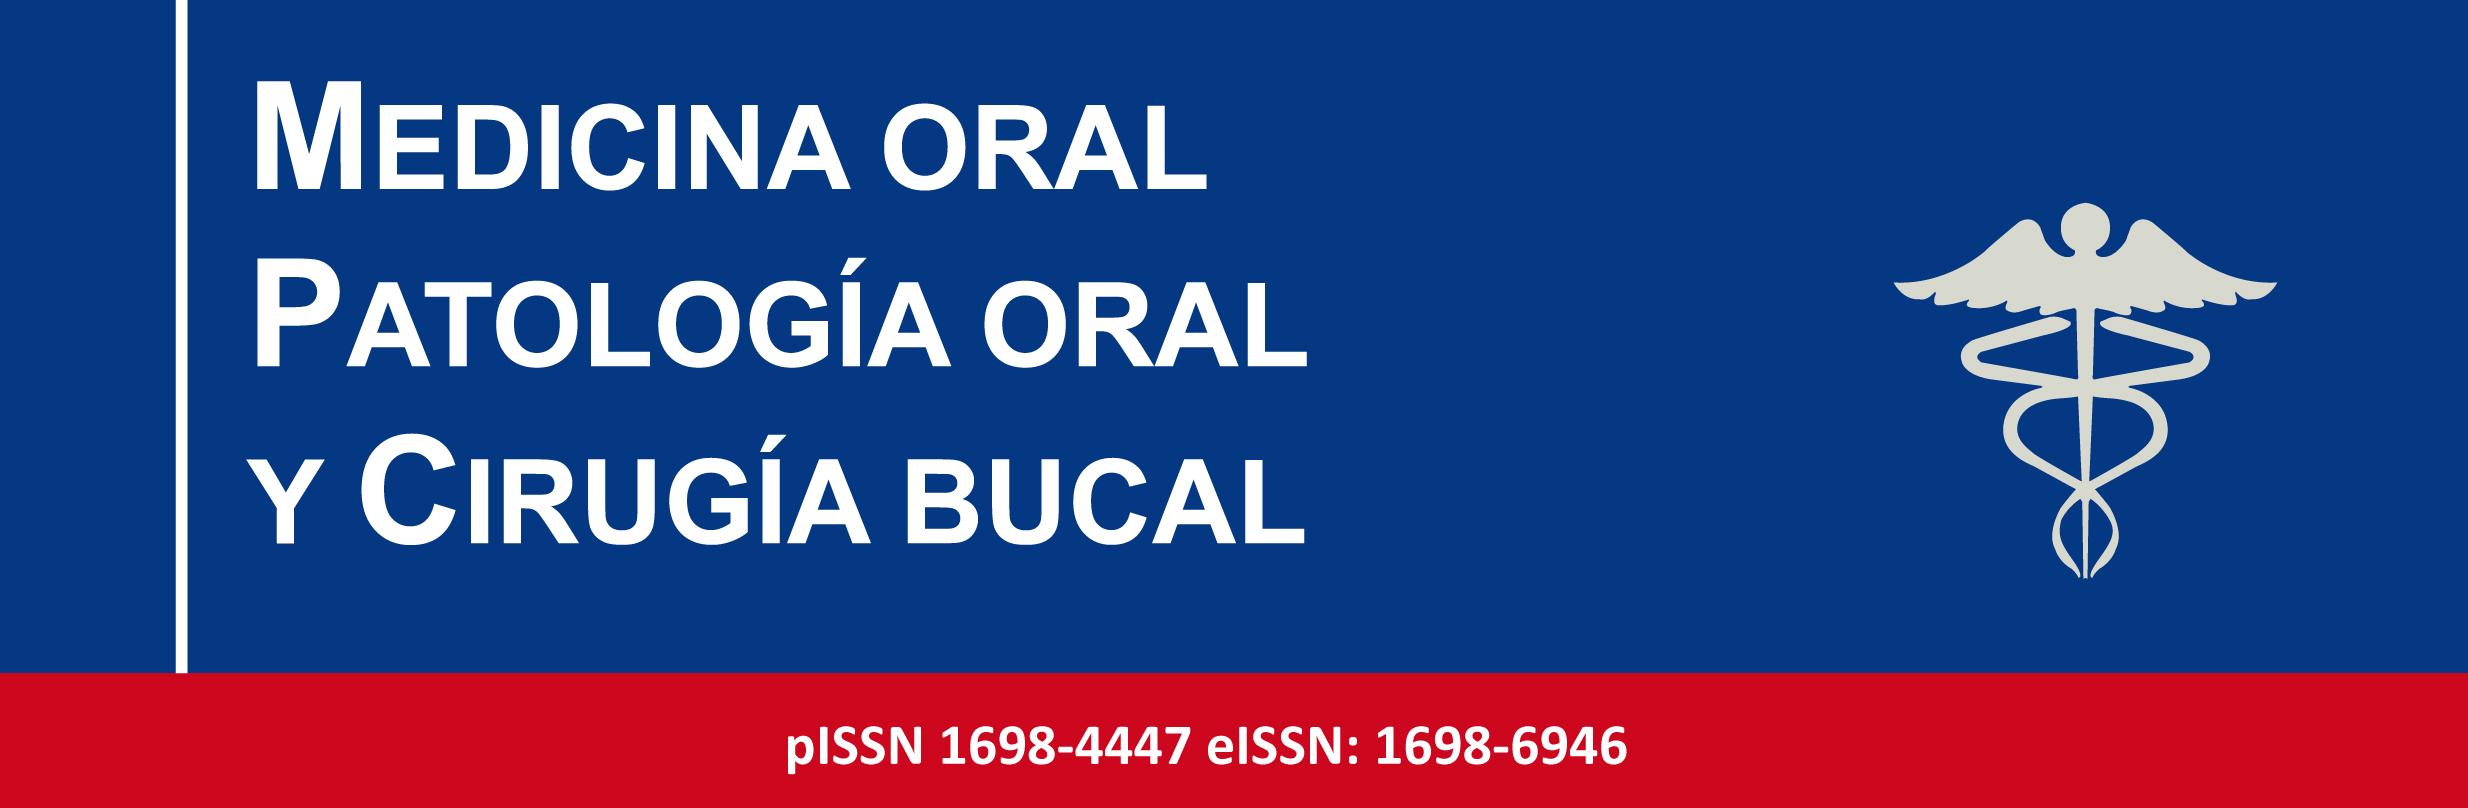 enterobius vermicularis helminto cancer pulmonar mediastinal